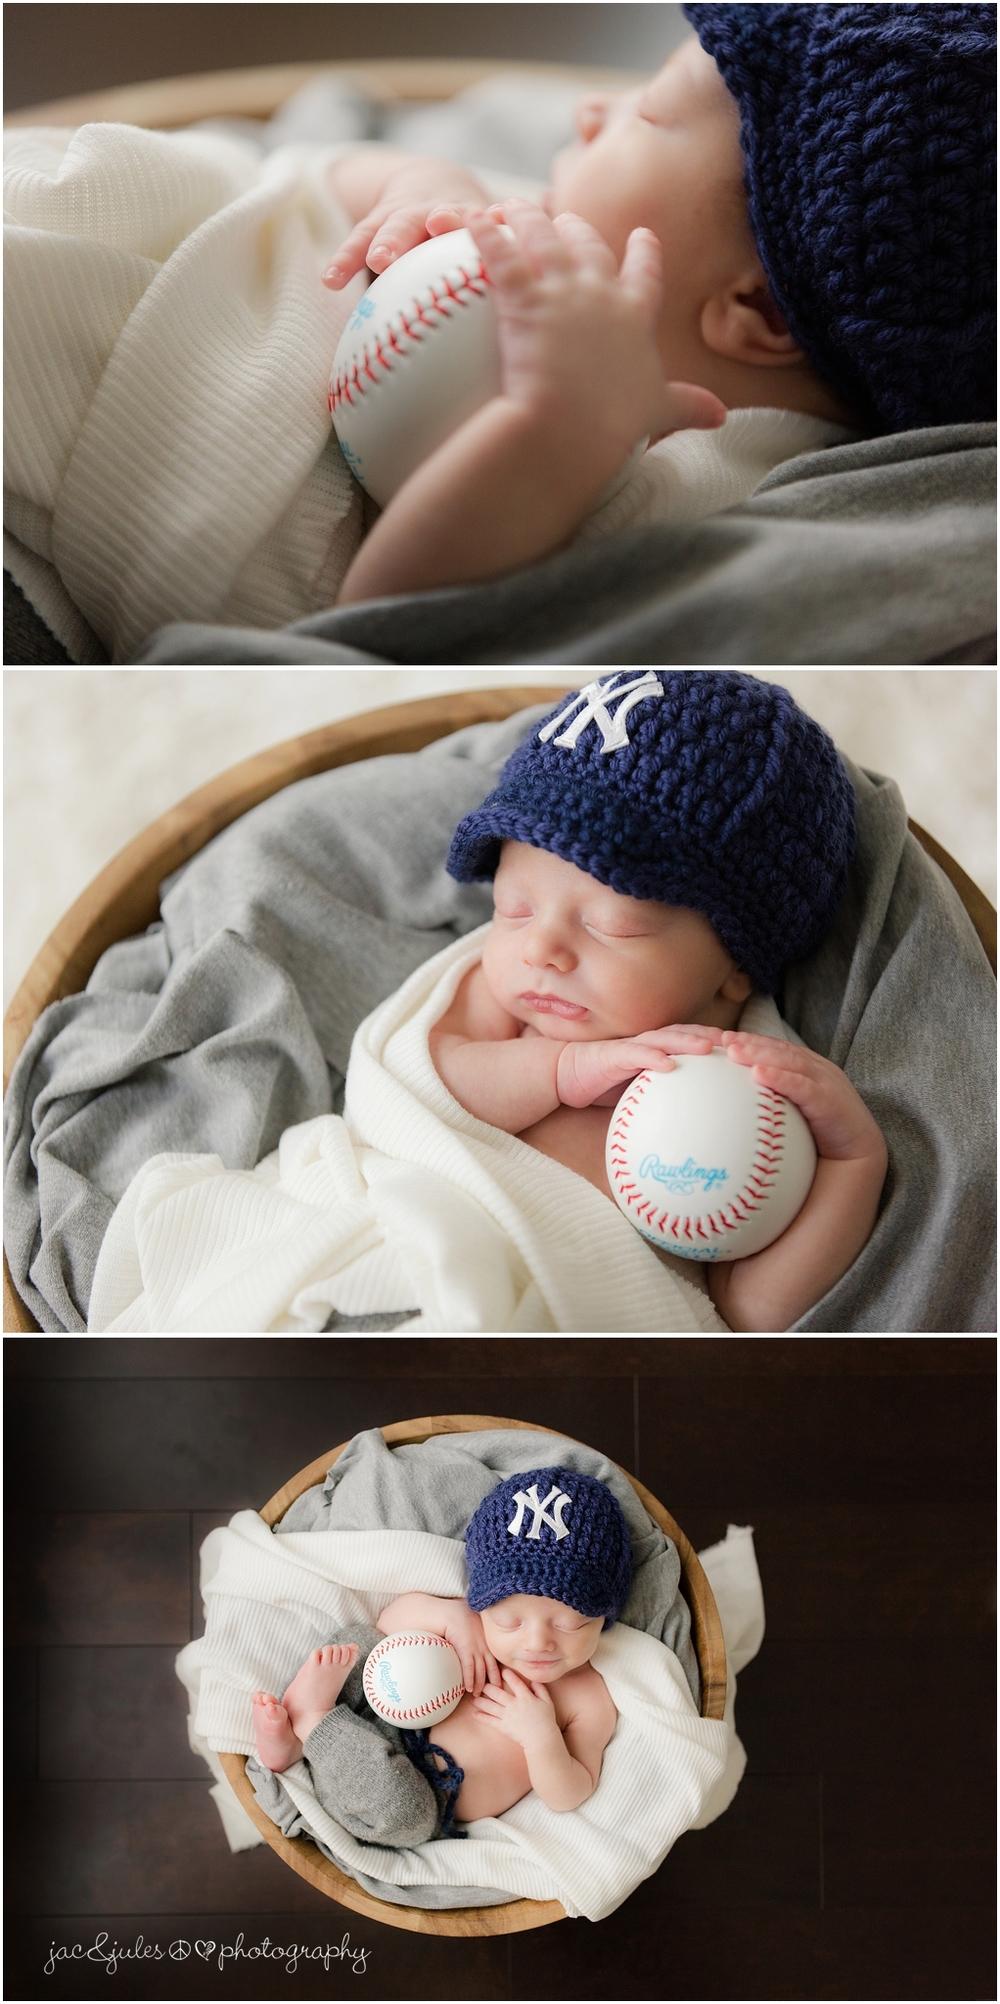 jacnjules photographs newborn in yankees hat and baseball in Marlboro NJ